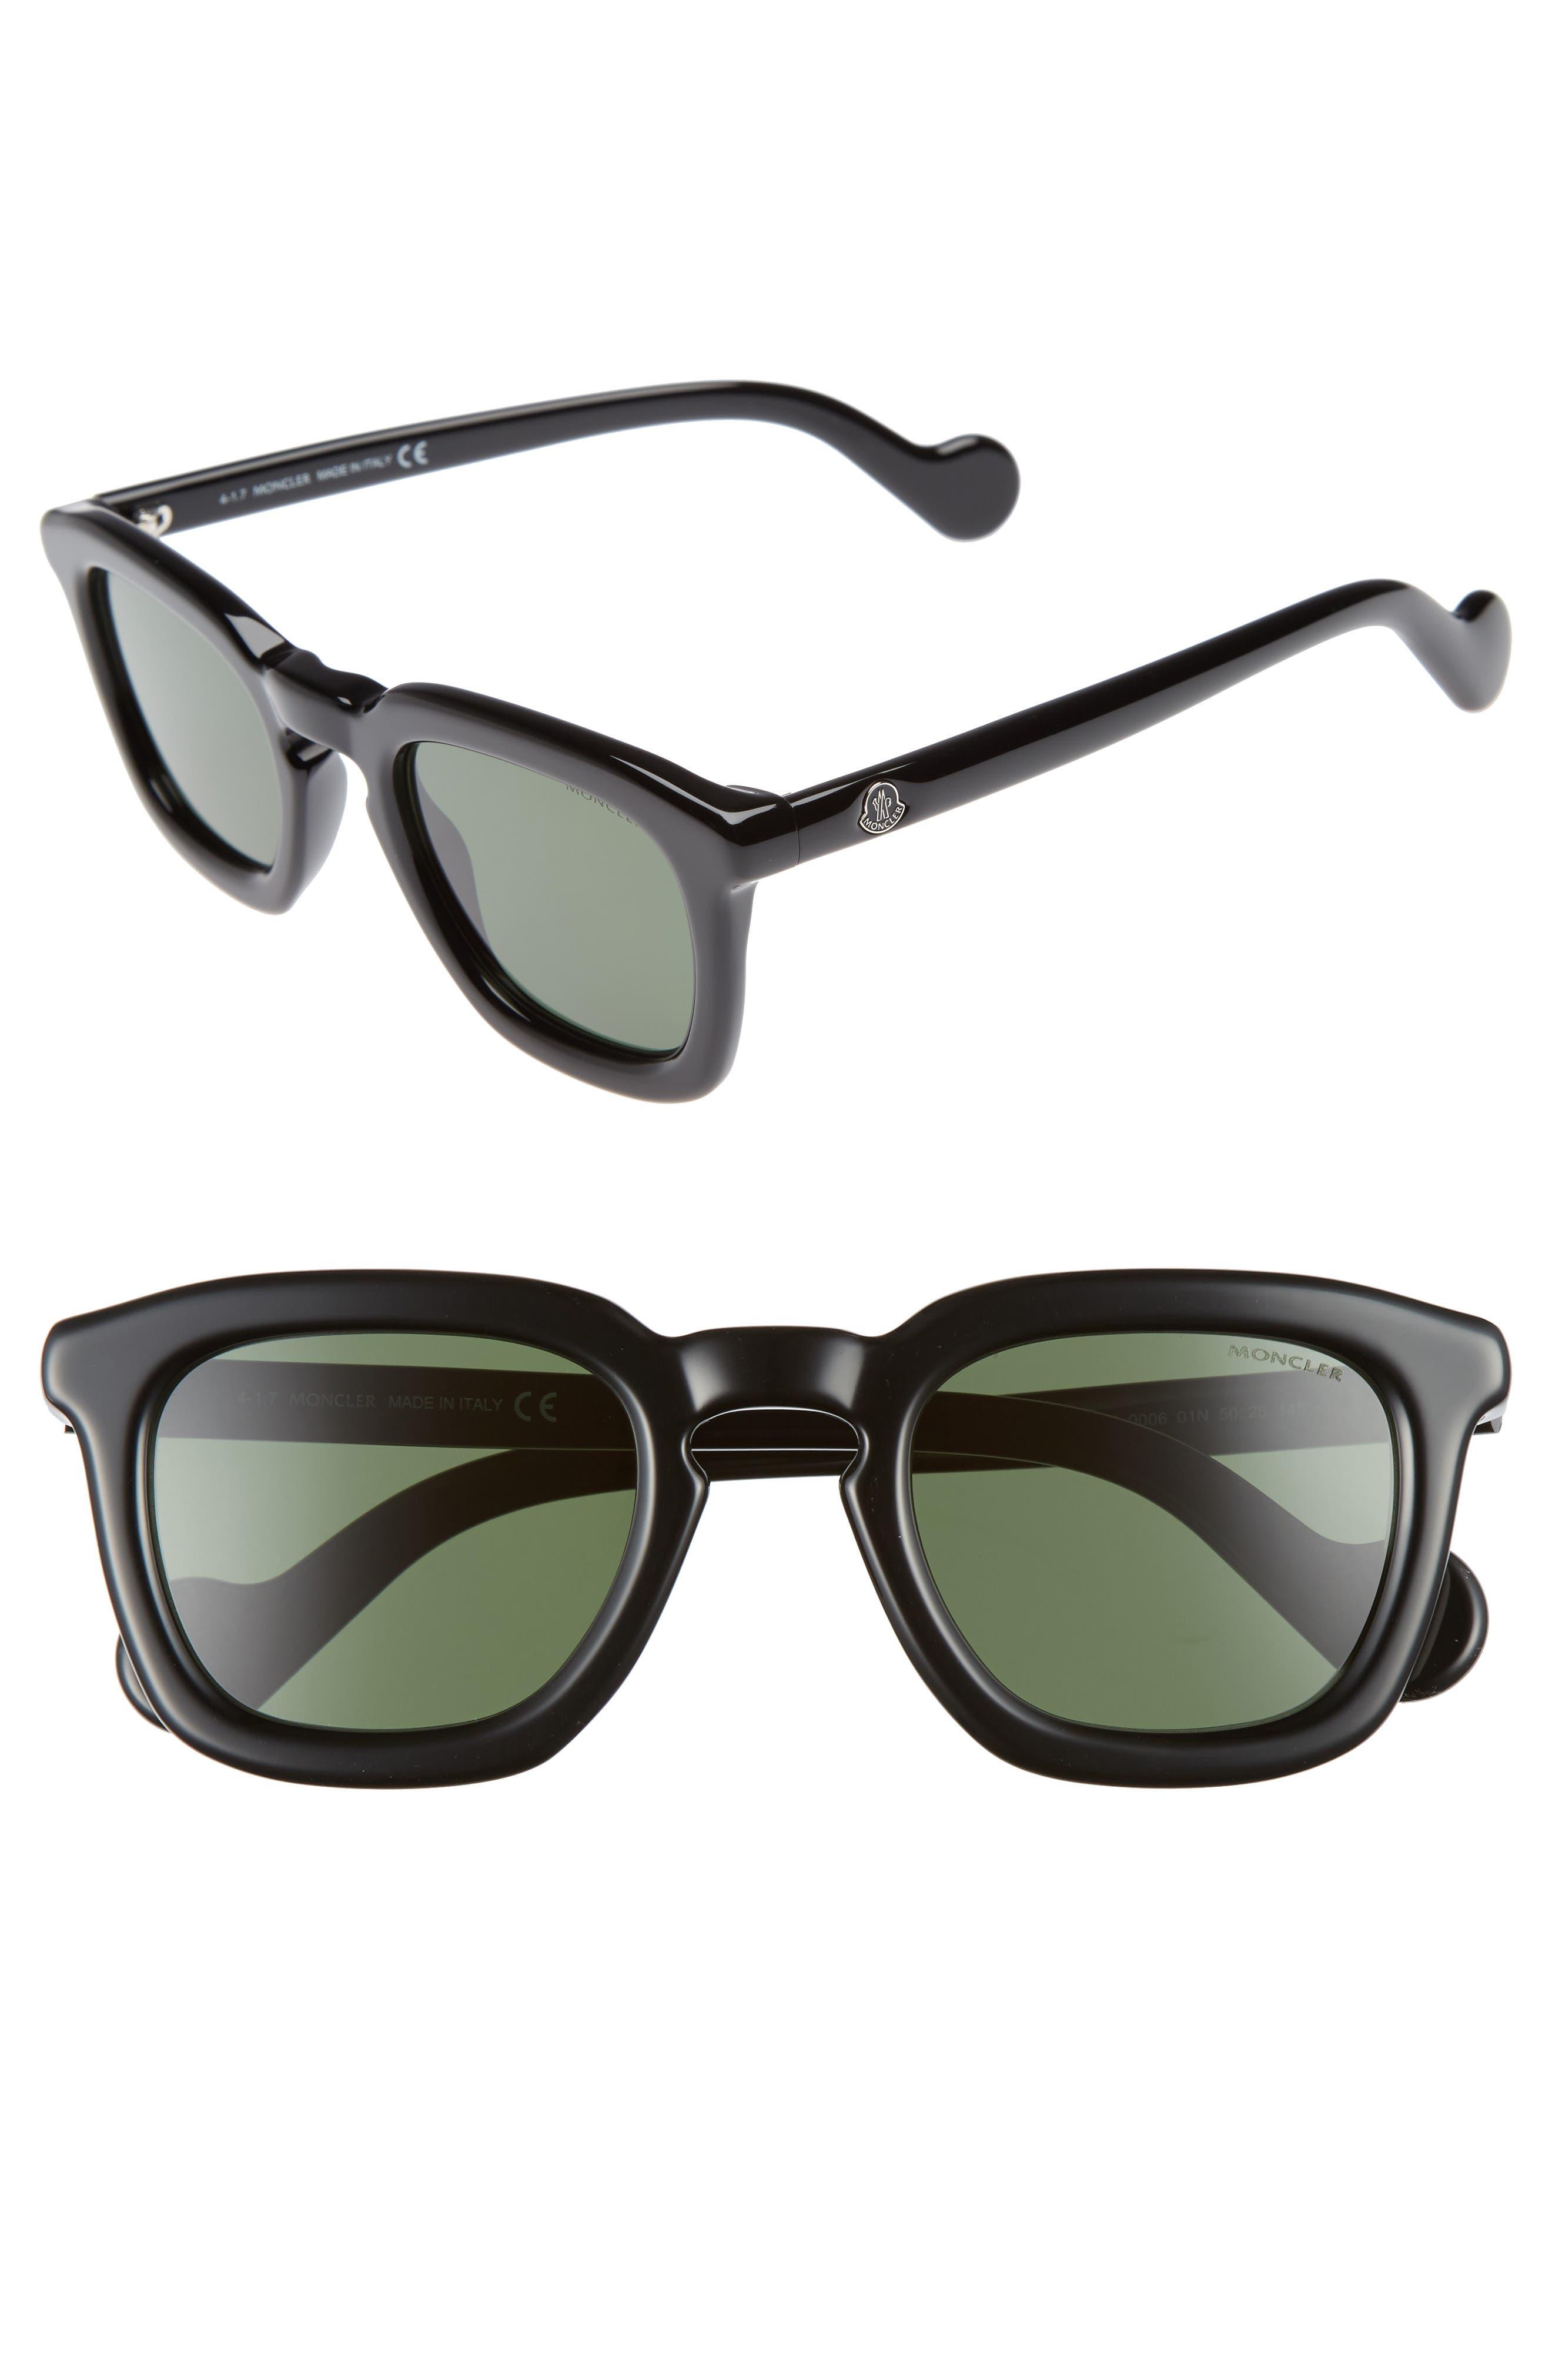 50mm Sunglasses,                         Main,                         color, Shiny Black/ Green